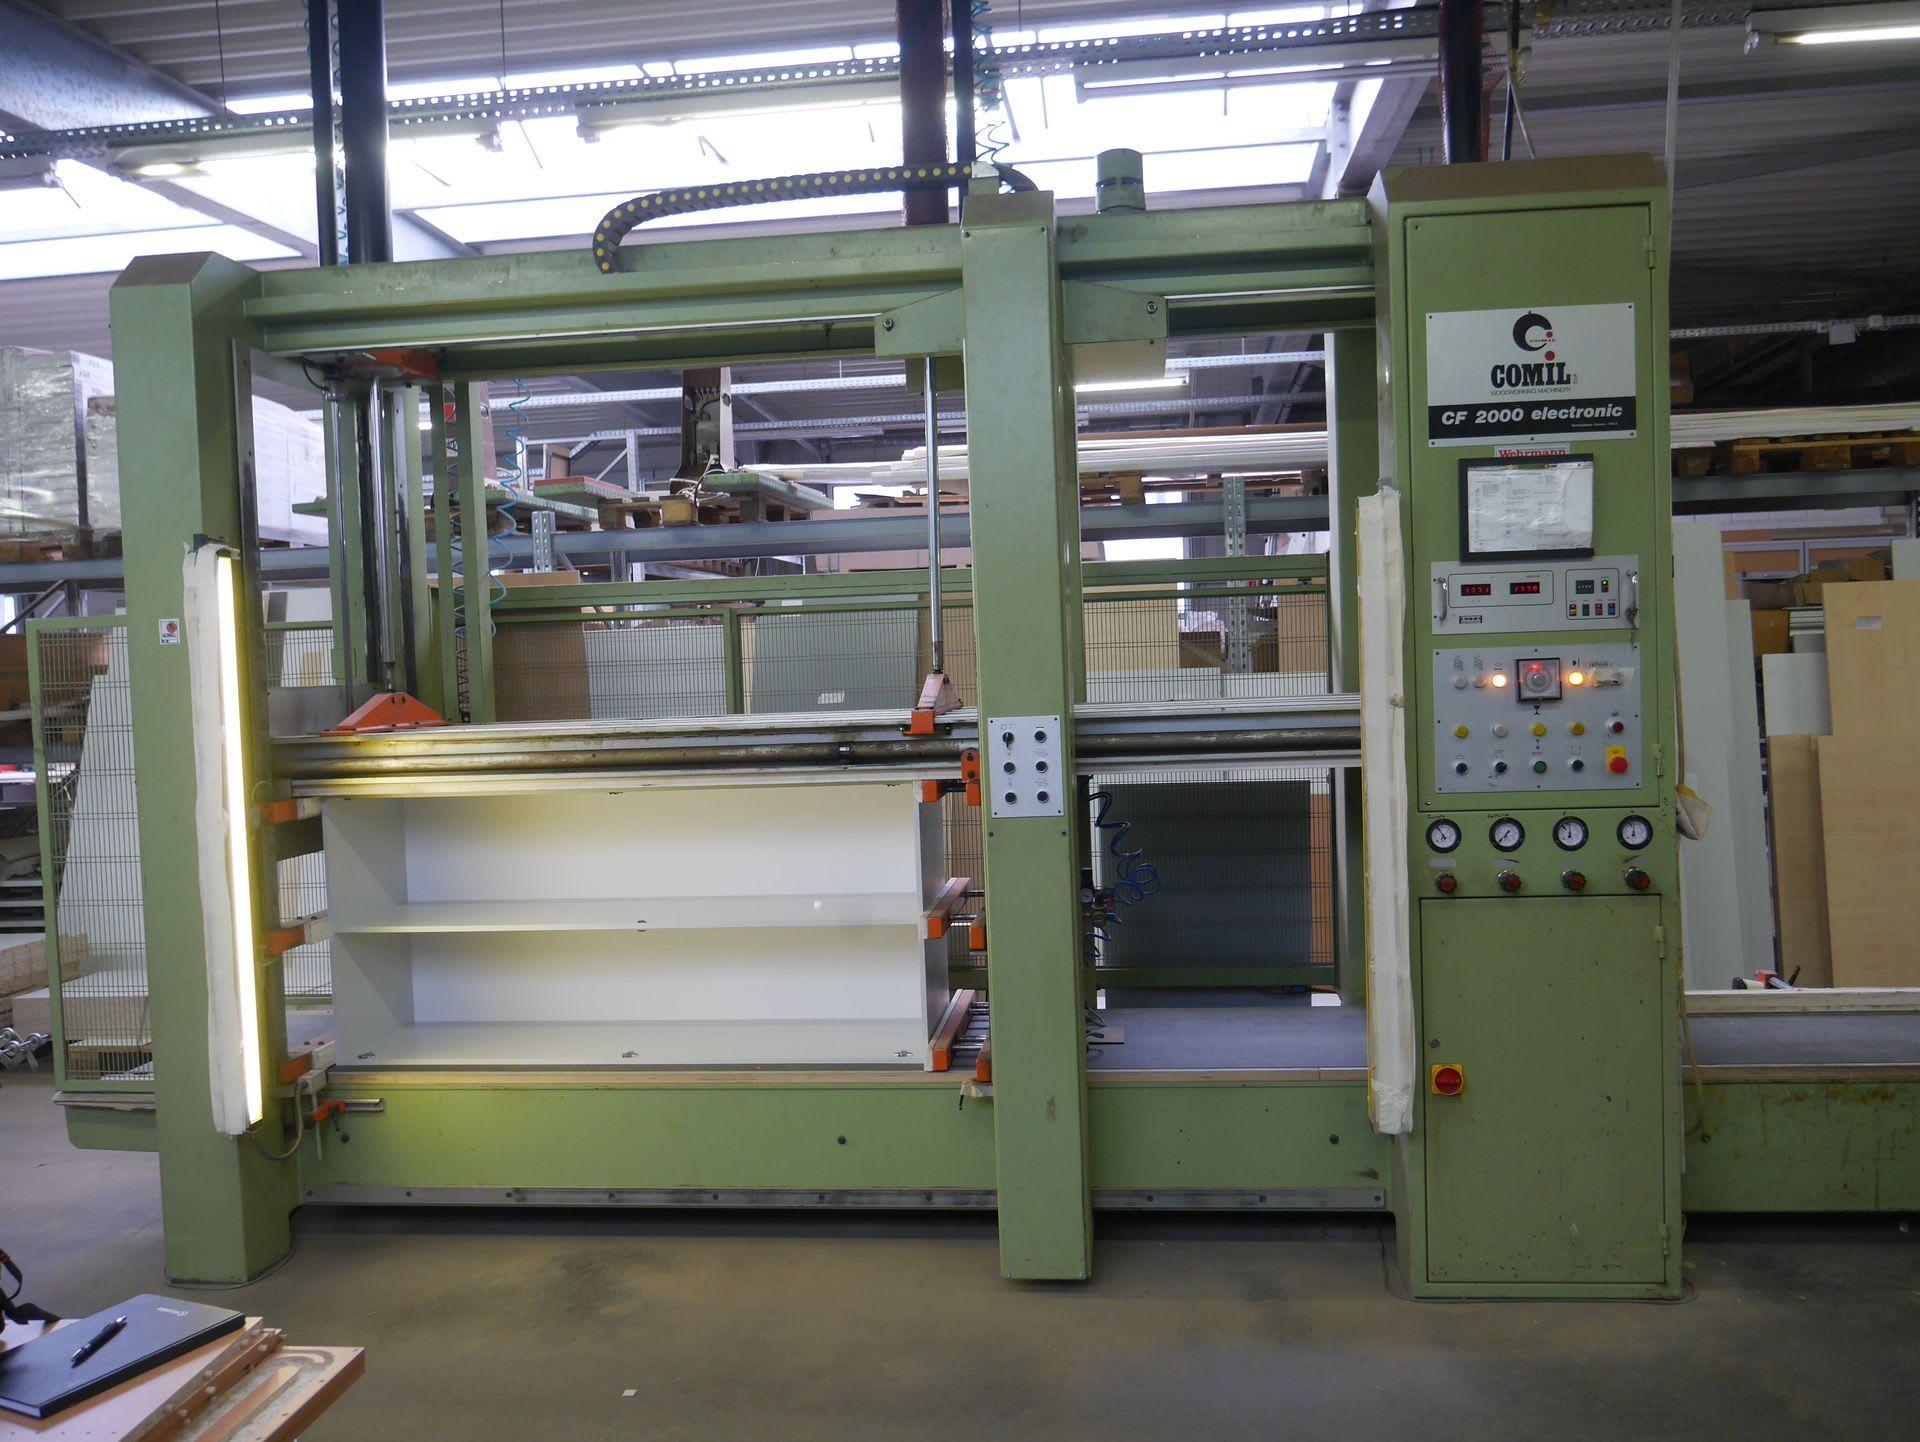 COMIL CF 2000 Electronic Korpuspresse